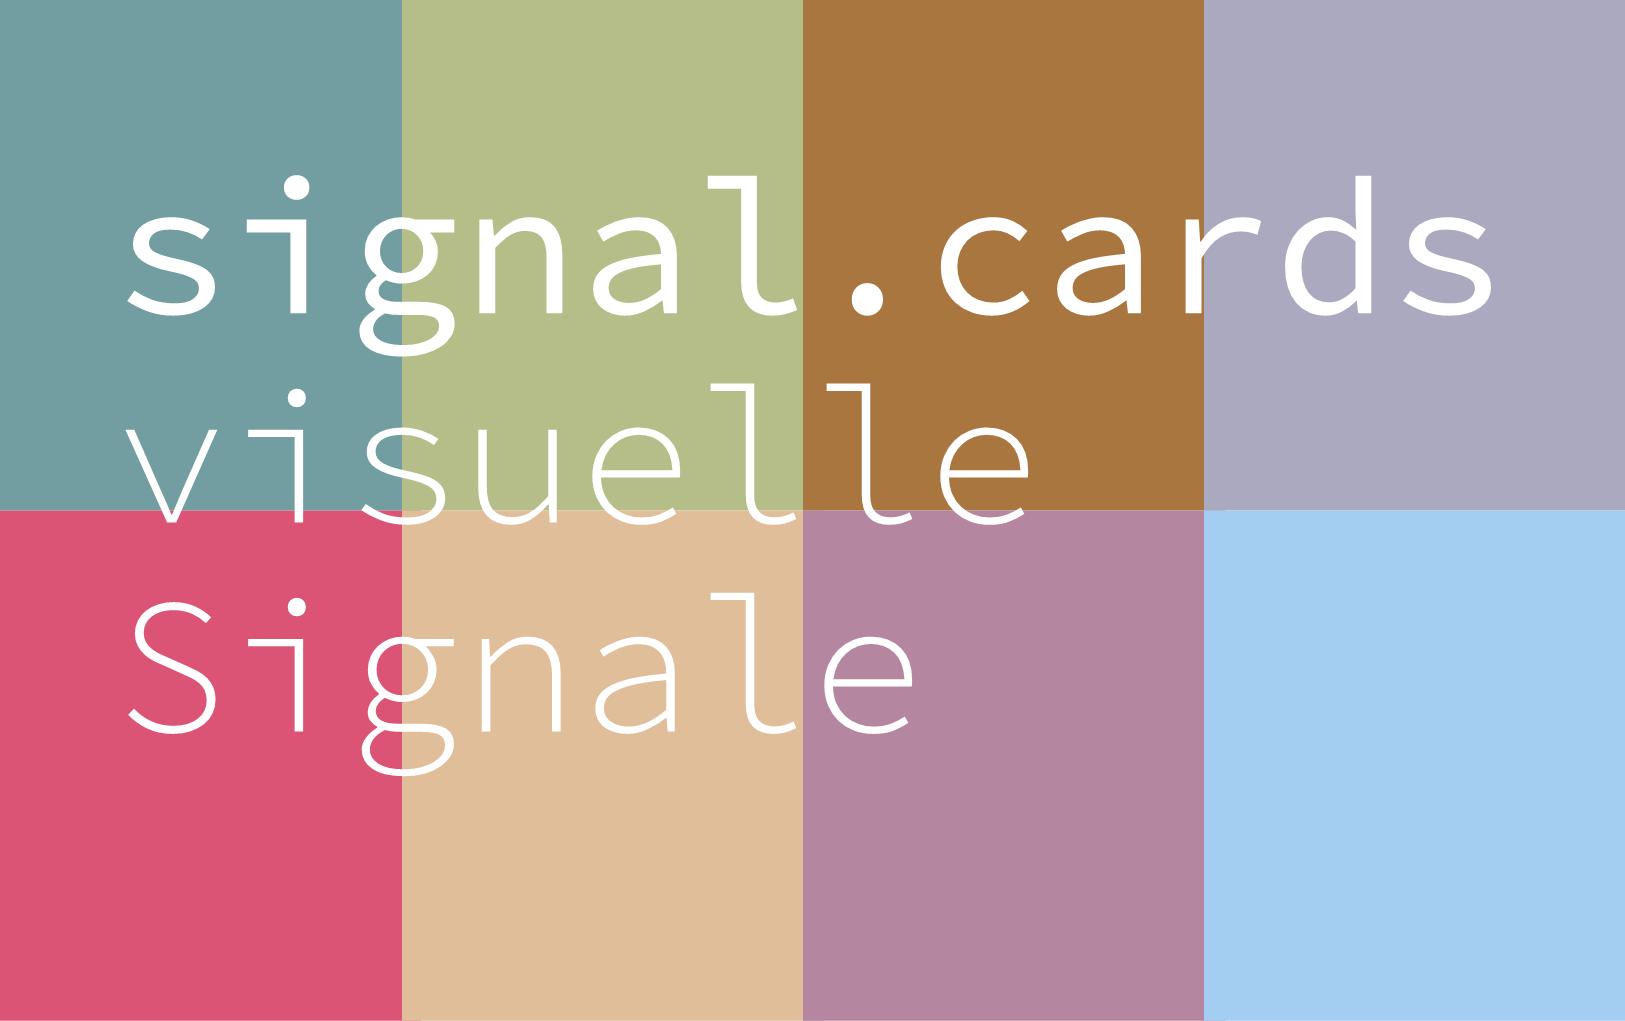 signal.cards